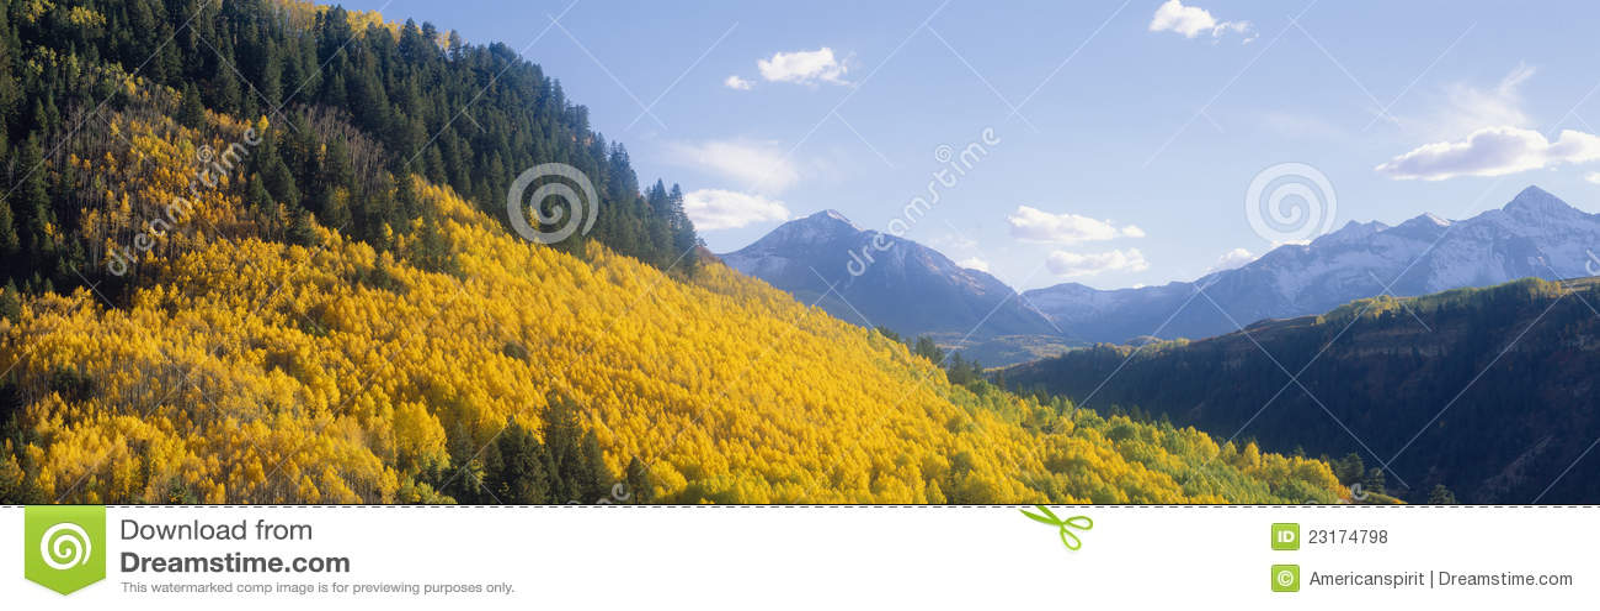 Espen im Herbst